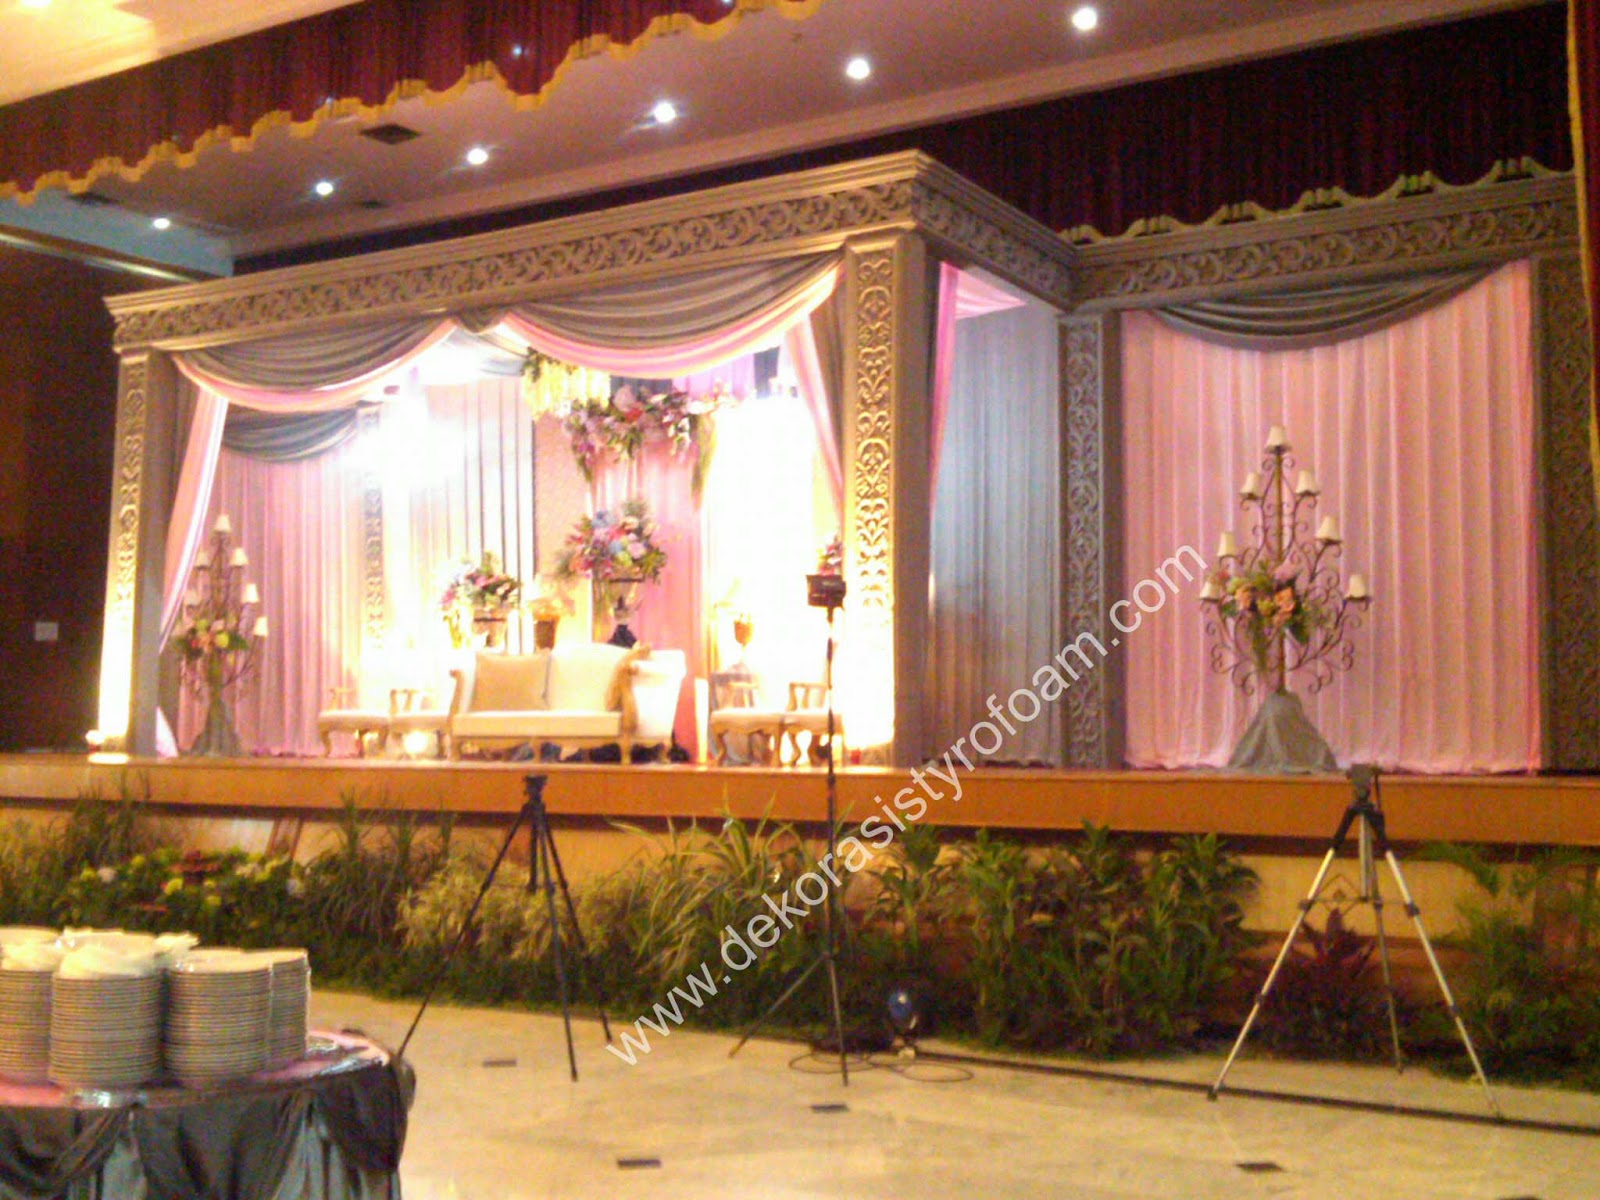 Dekorasi styrofoam dekorasi pelaminan a 3 for Dekorasi lebaran hotel